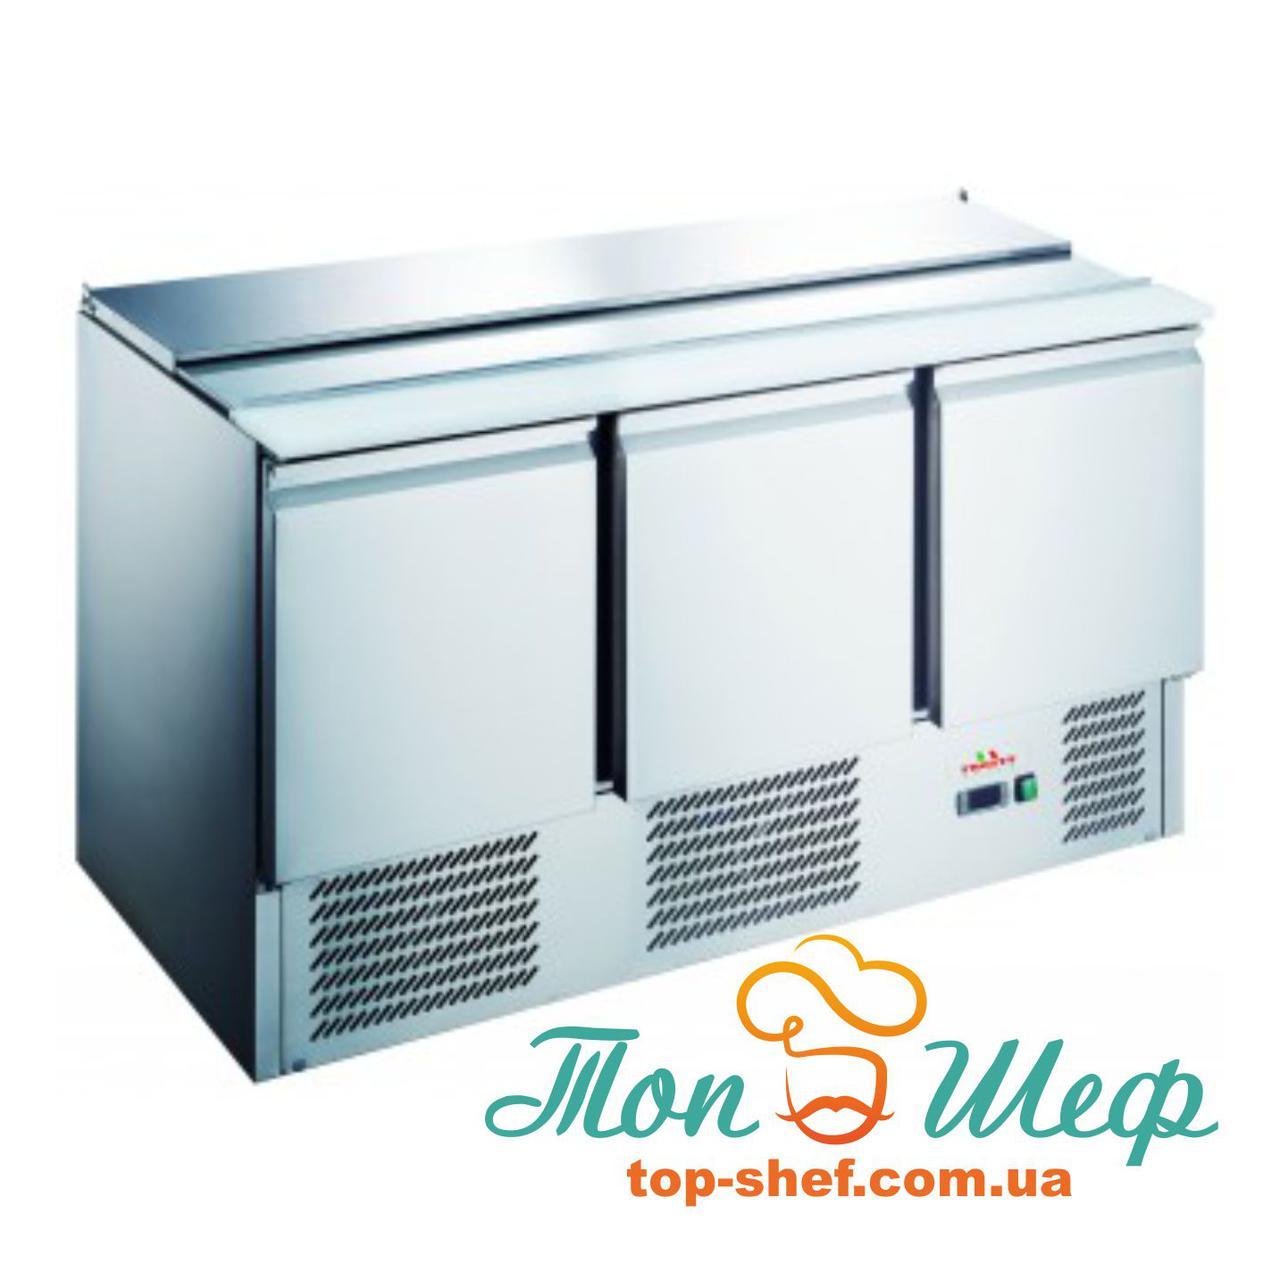 Стол холодильный Frosty S903